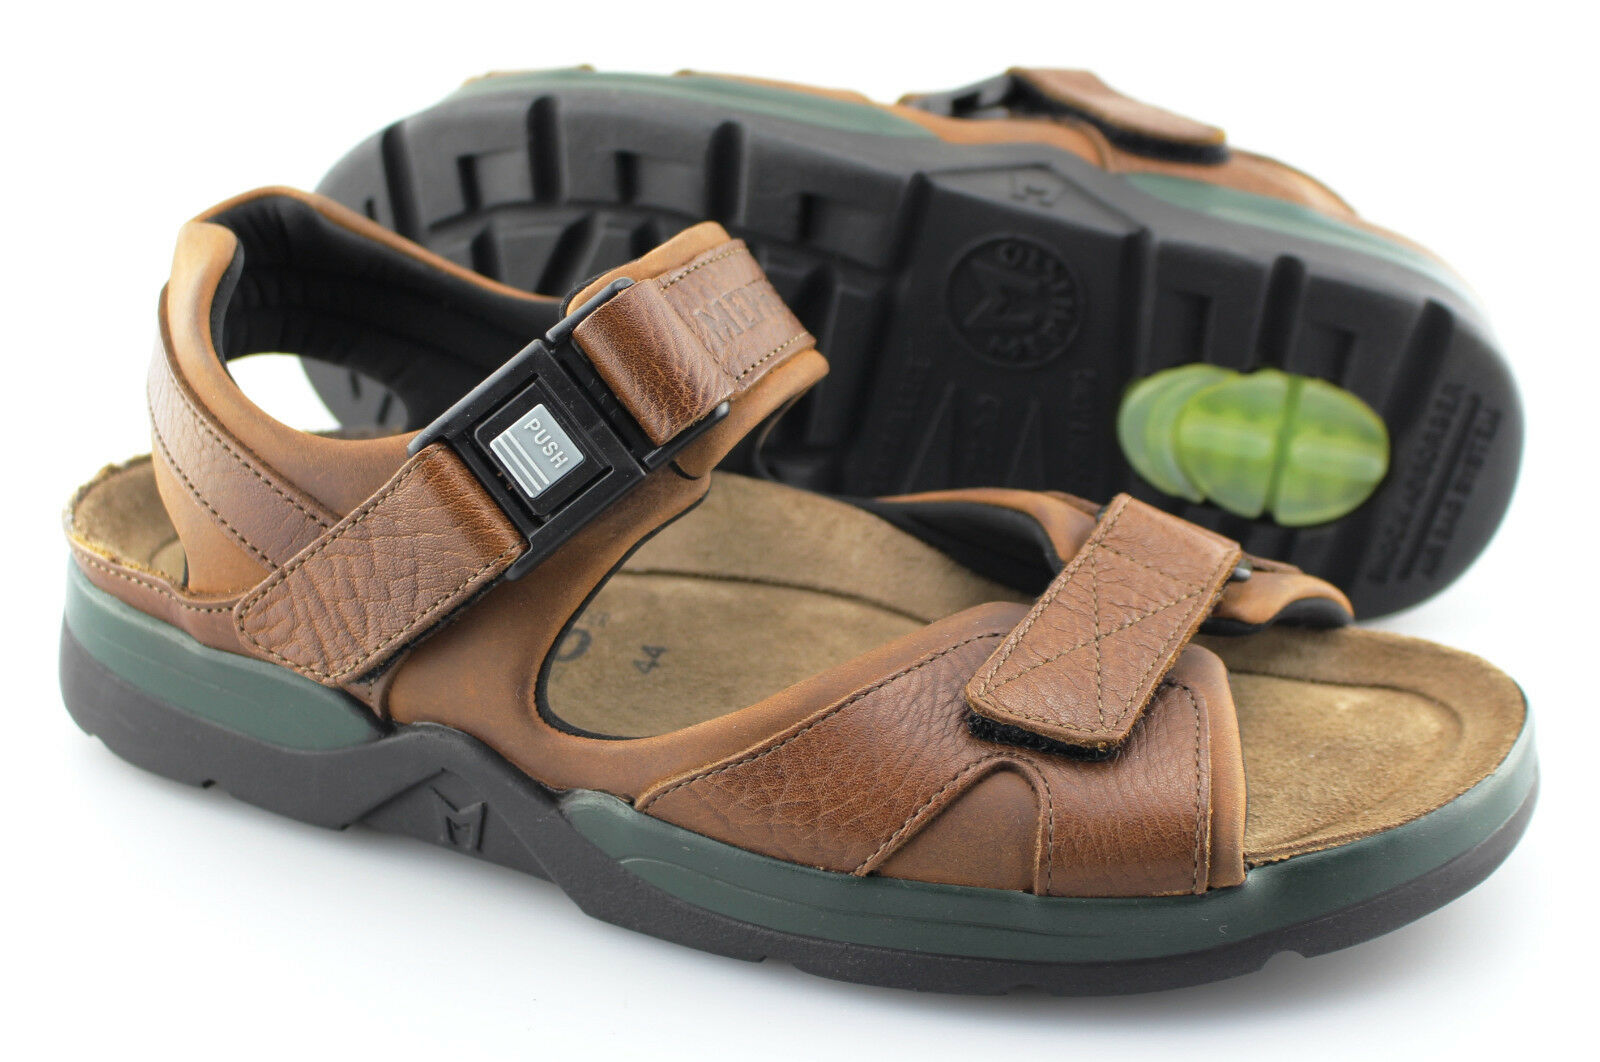 Men's MEPHISTO 'Shark' Brown Leather Sandals Size US 10 EUR 44